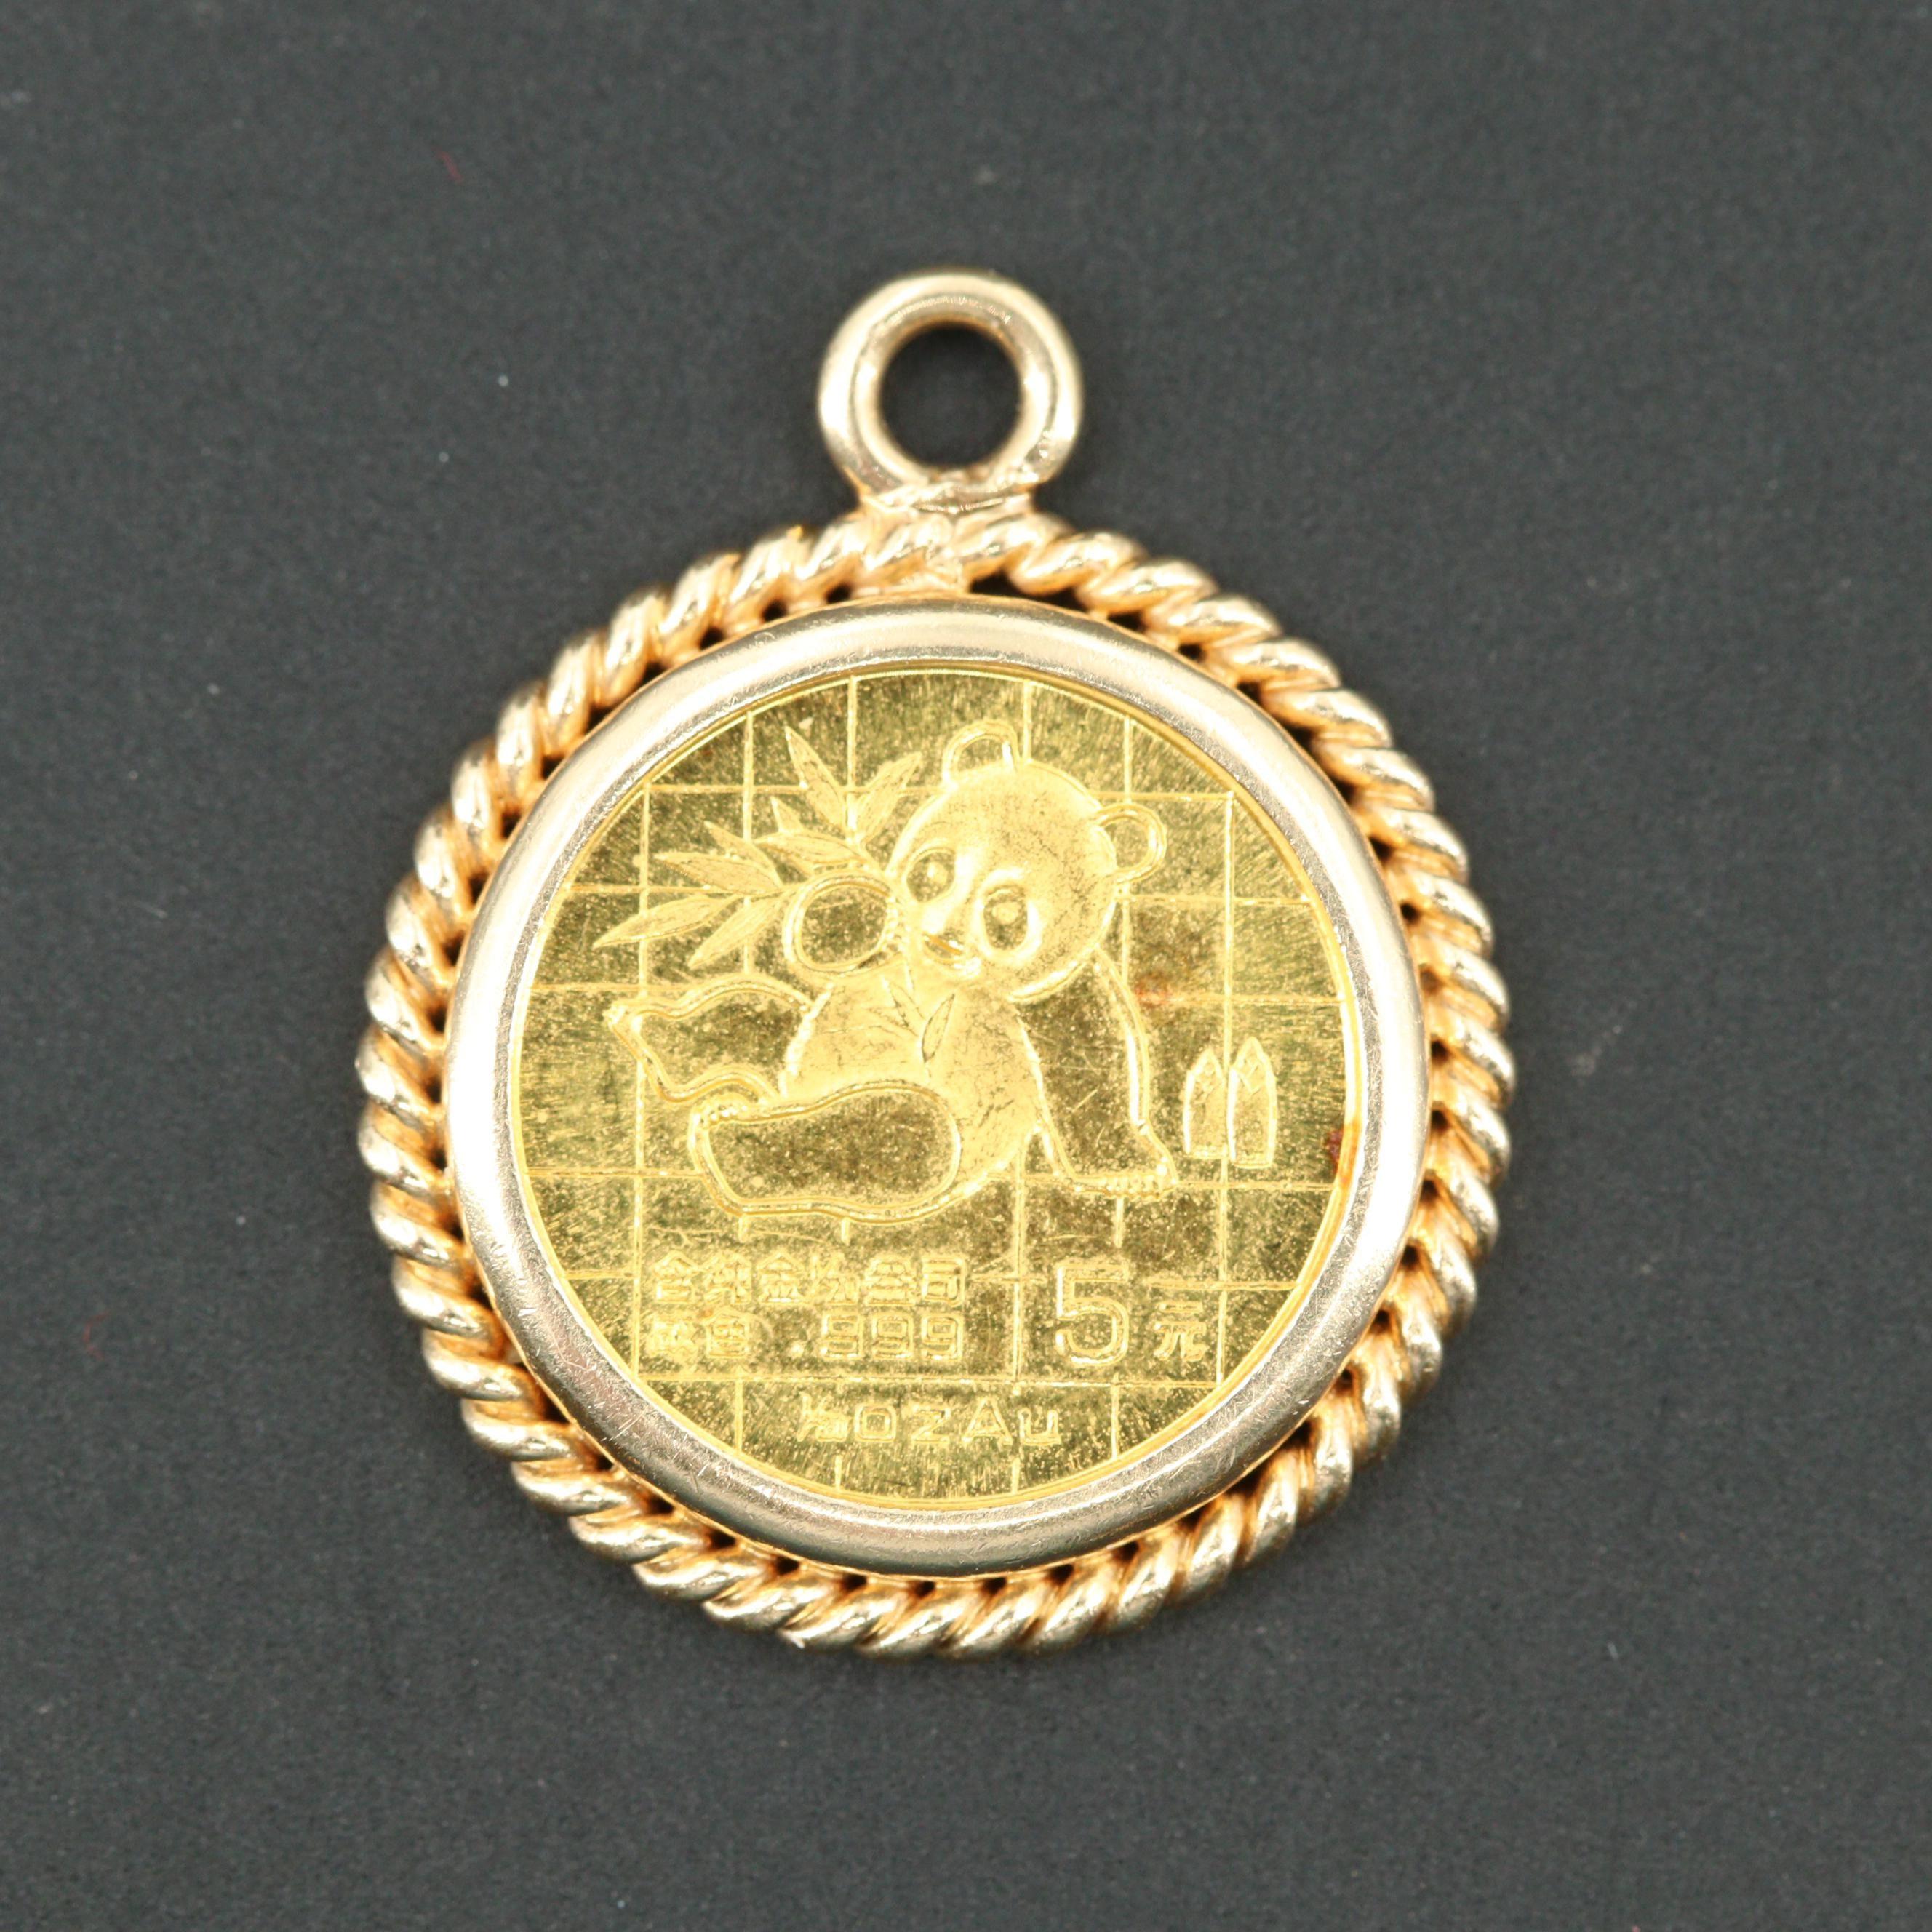 1989 China 5 Yuan Panda Gold Pendant